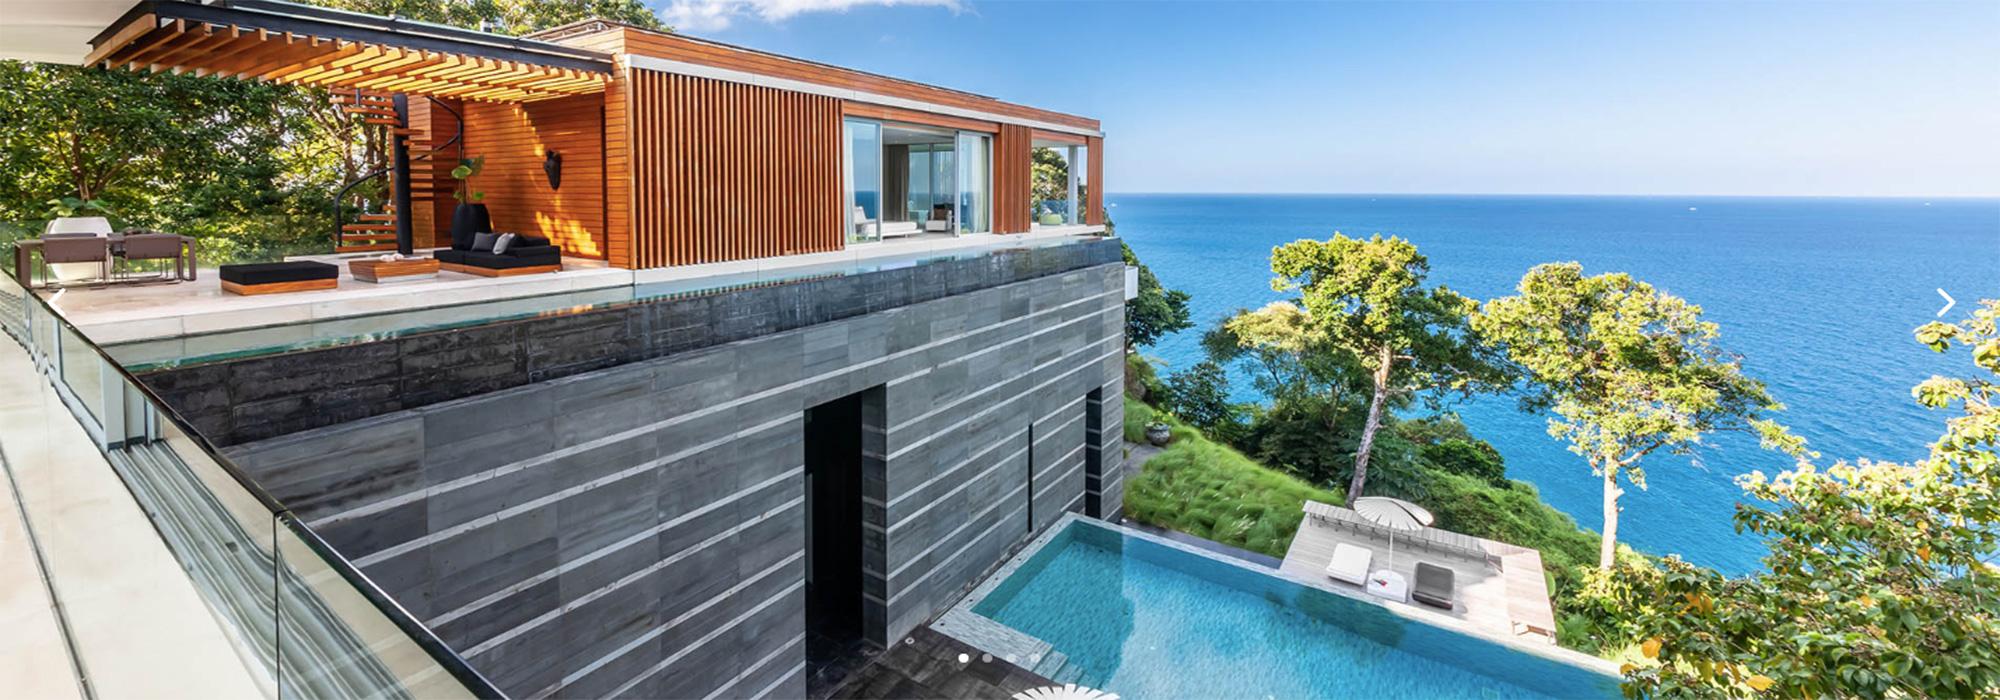 Luxury Villa for Rent Phuket. Ocean Front